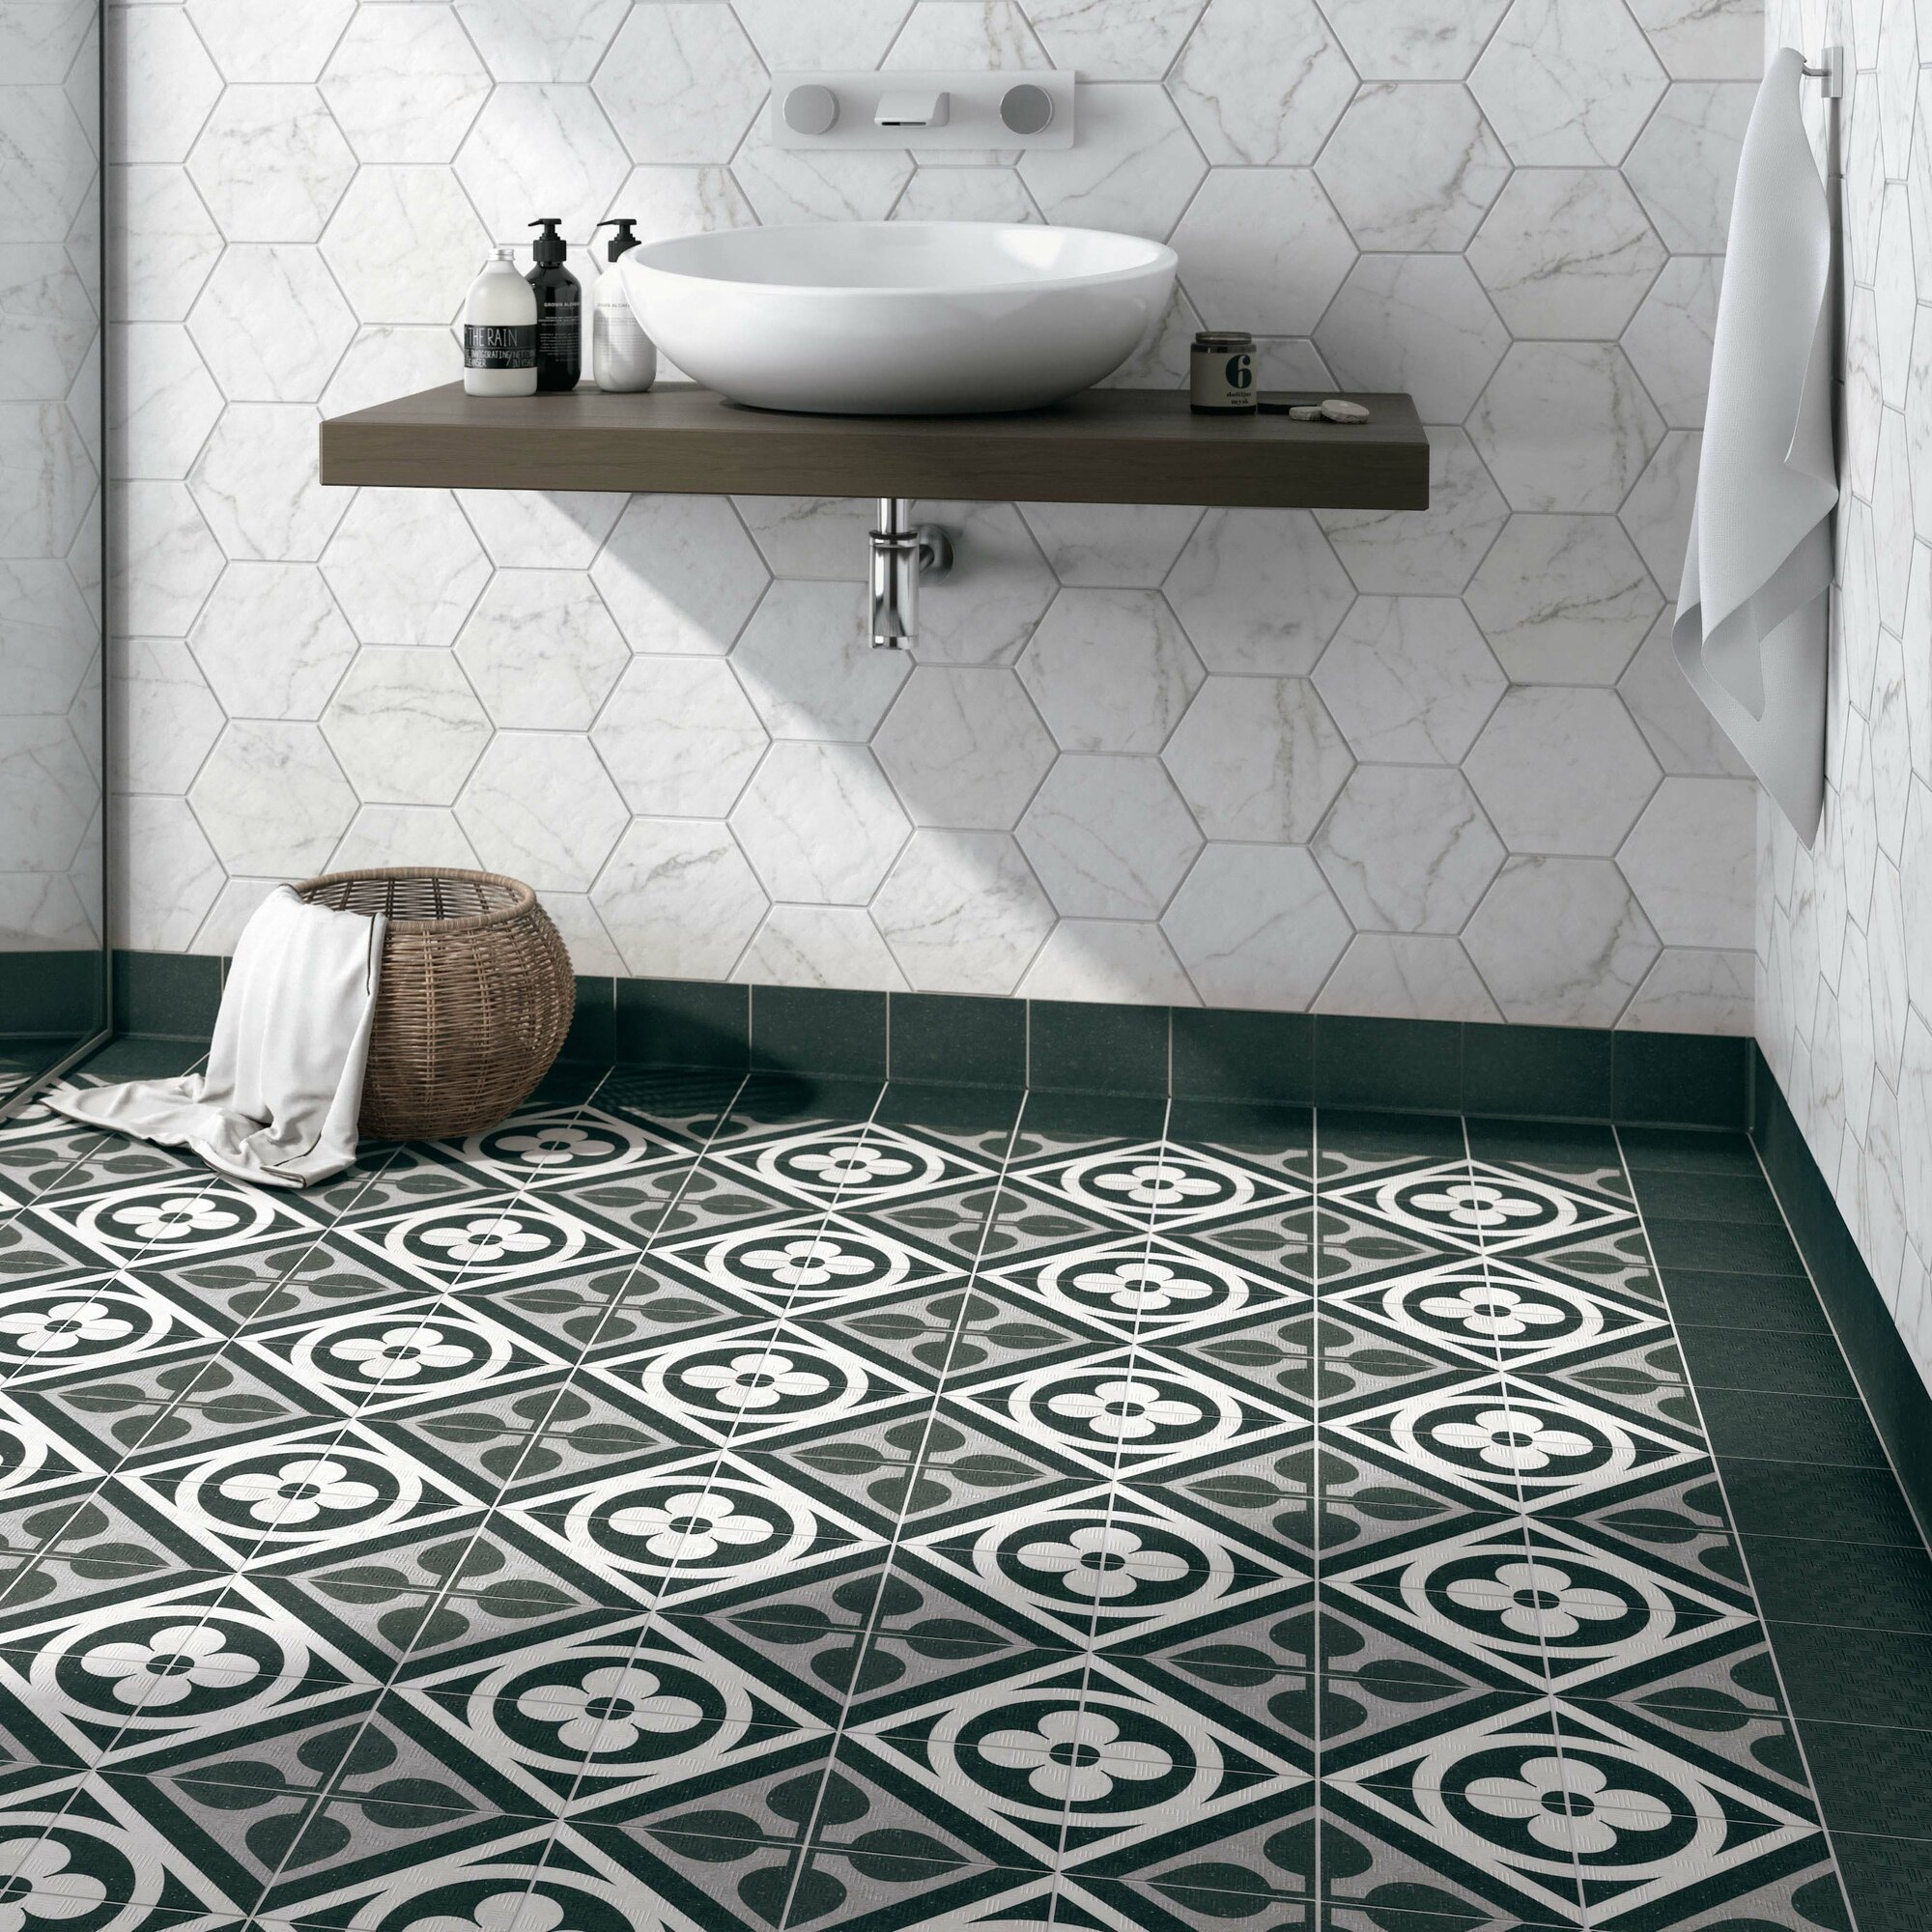 4 x 8 subway tile choice image tile flooring design ideas 4x8 subway tile patterns4 x 8 subway tile image collections tile 4 x 8 subway tile dailygadgetfo Choice Image